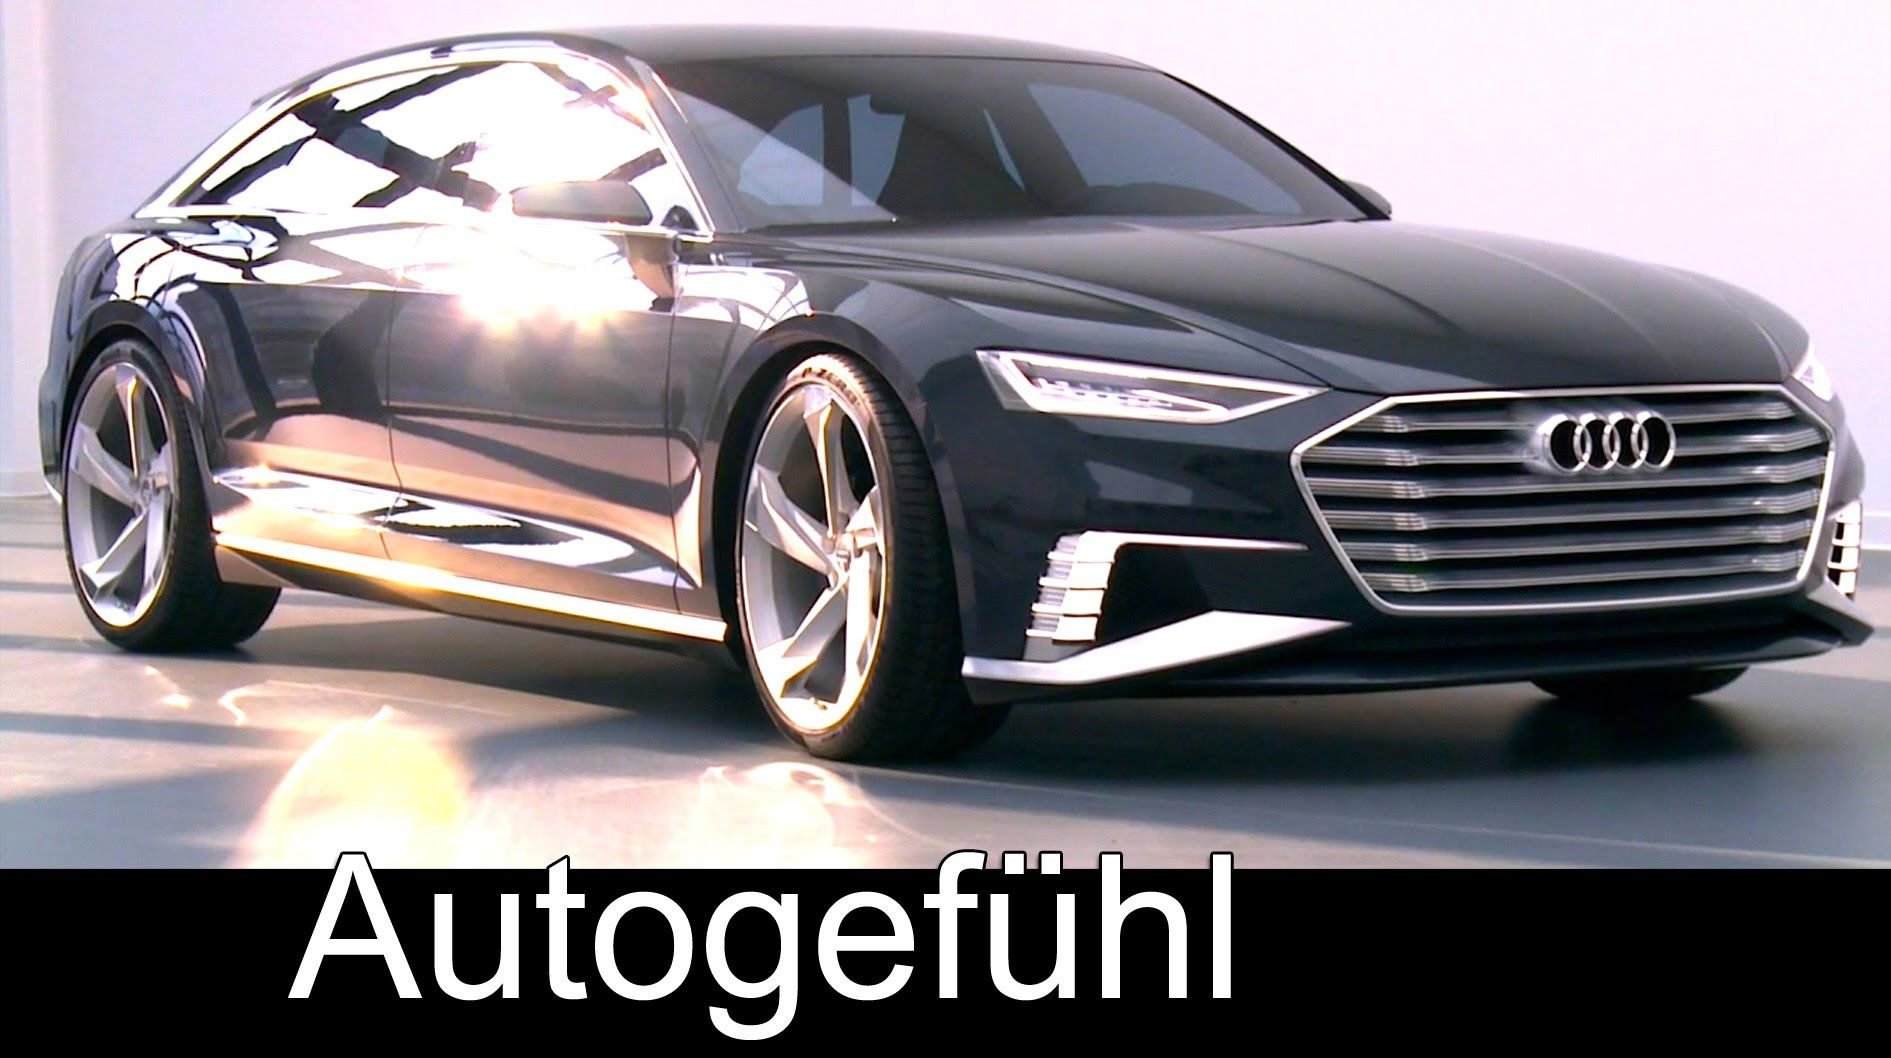 2021 Audi A9 Concept Release